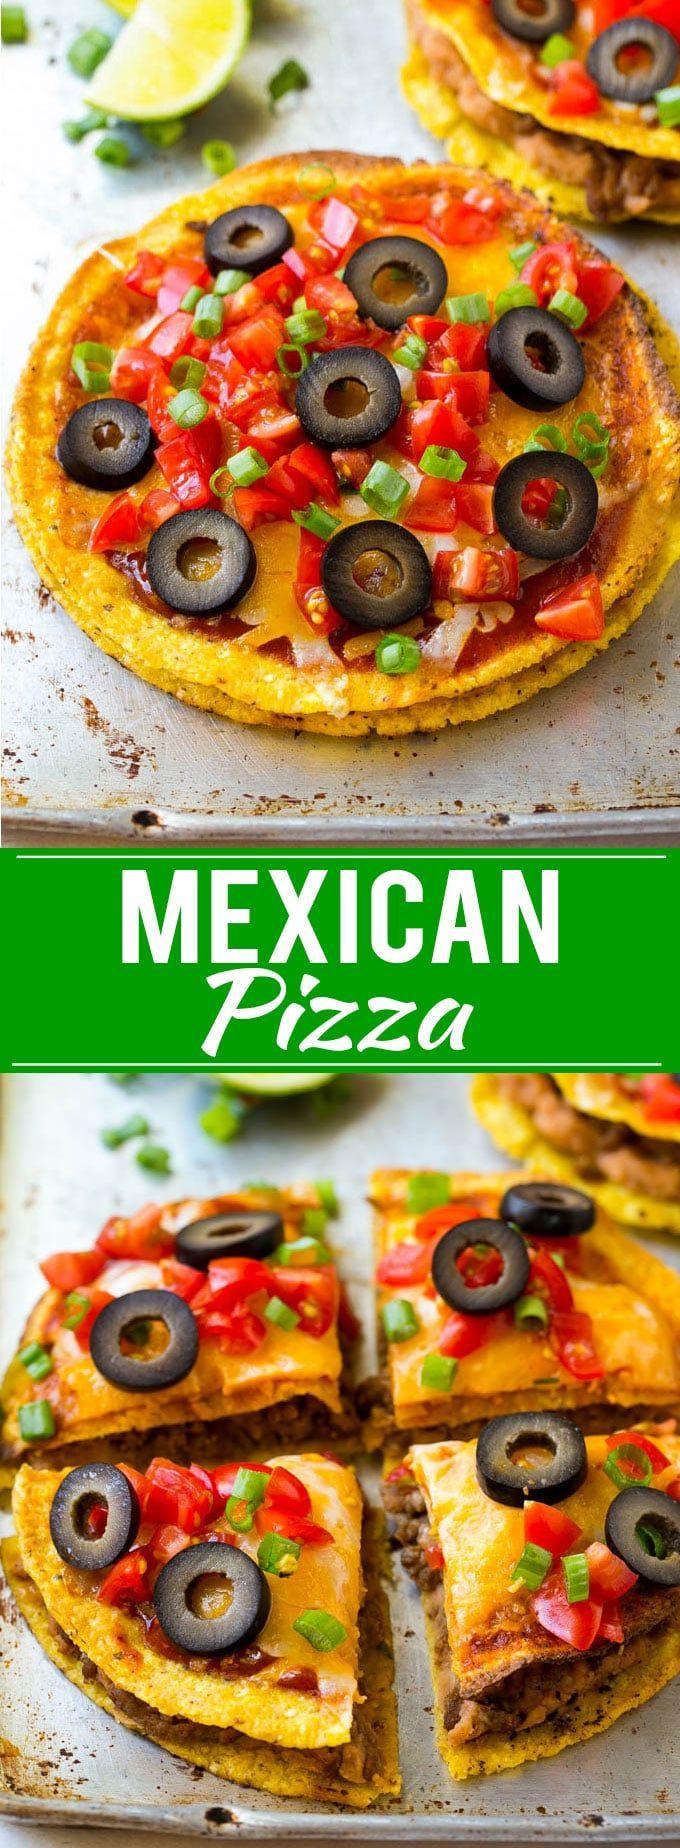 Mexican Pizza Recipe | Tostada Recipe | Taco Bell Copycat Recipe | Easy Mexican Food